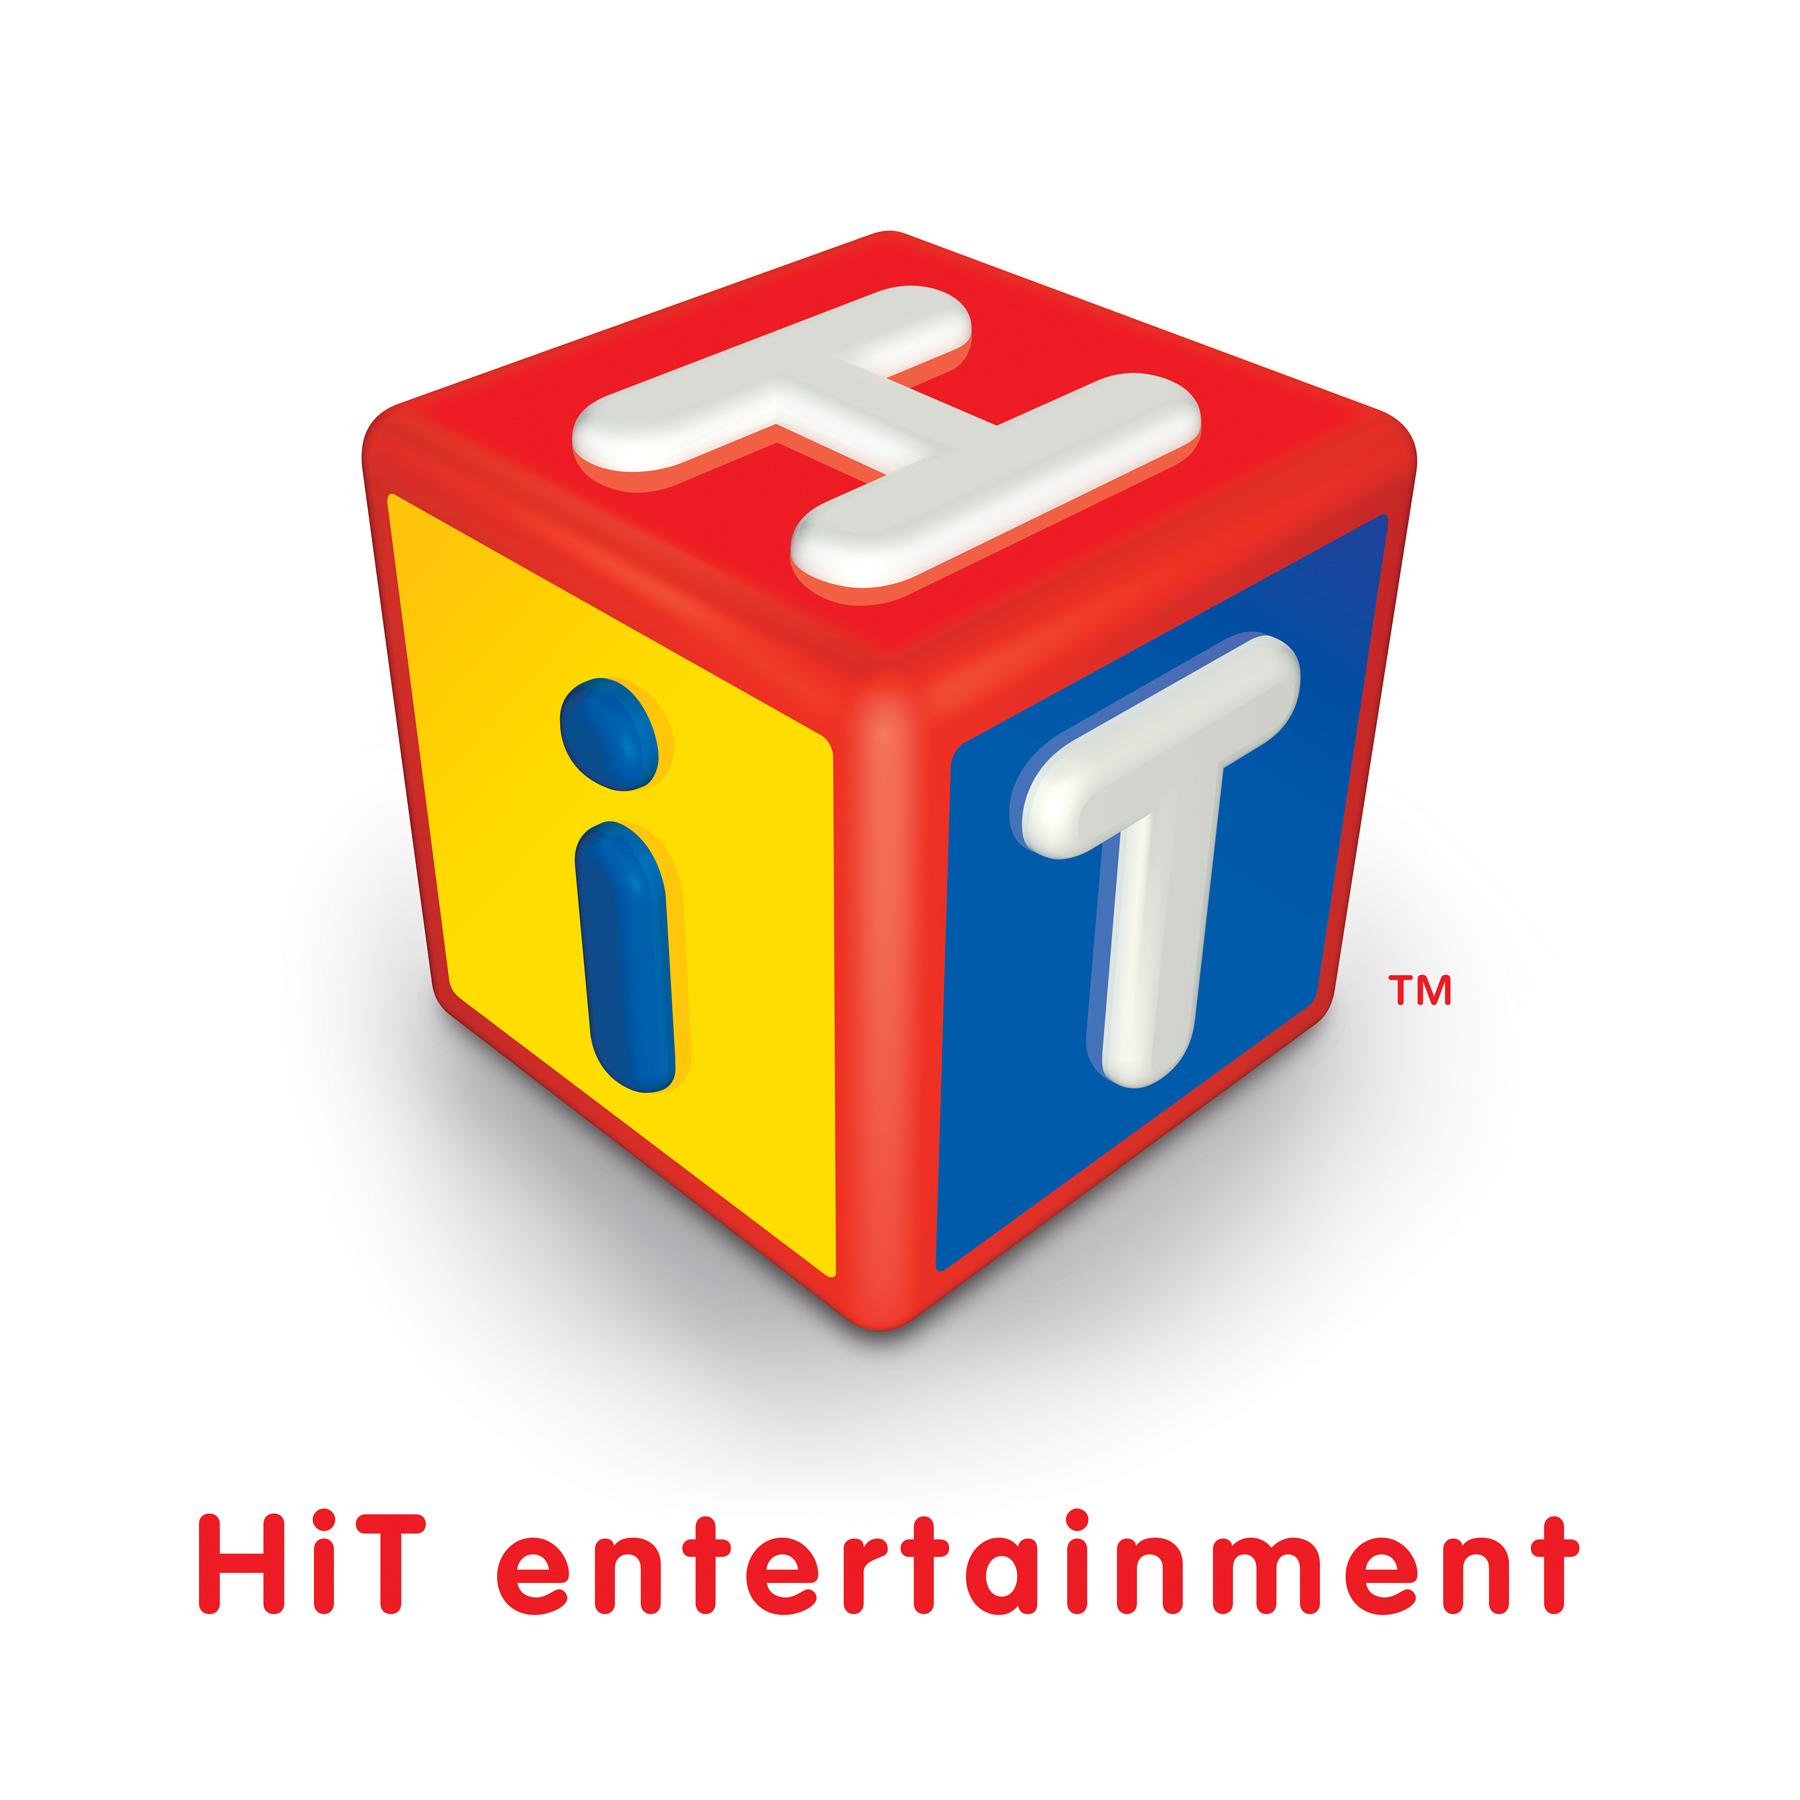 HIT Entertainment Brings Fireman Sam® Franchise to Amazon.